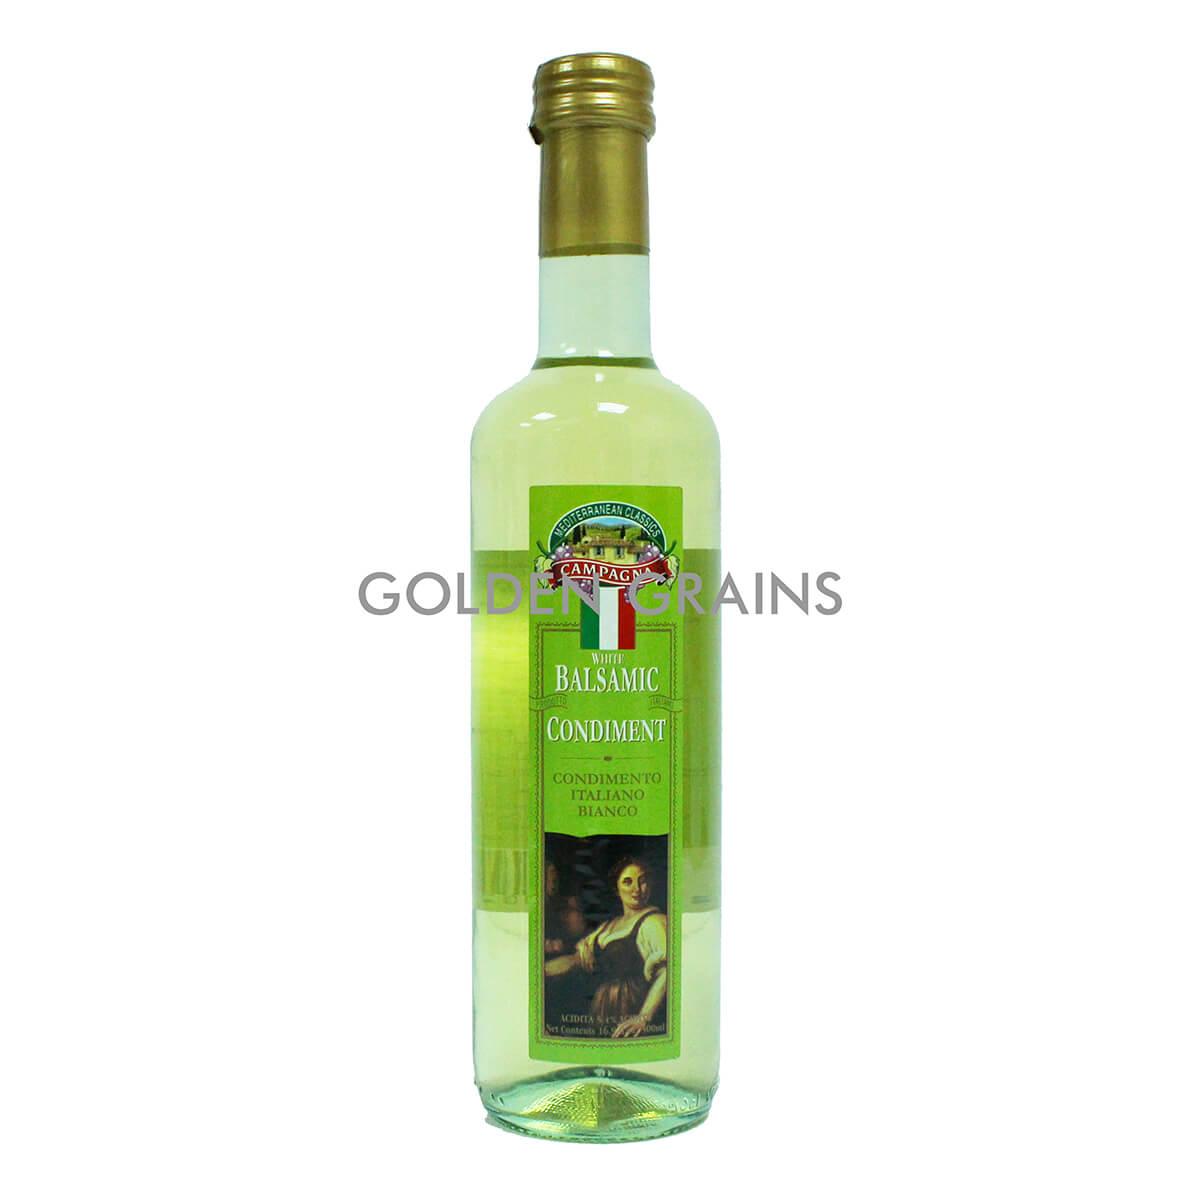 Golden Grains Campagna - Balsamic Vinegar - 500ML - Italy - Front.jpg